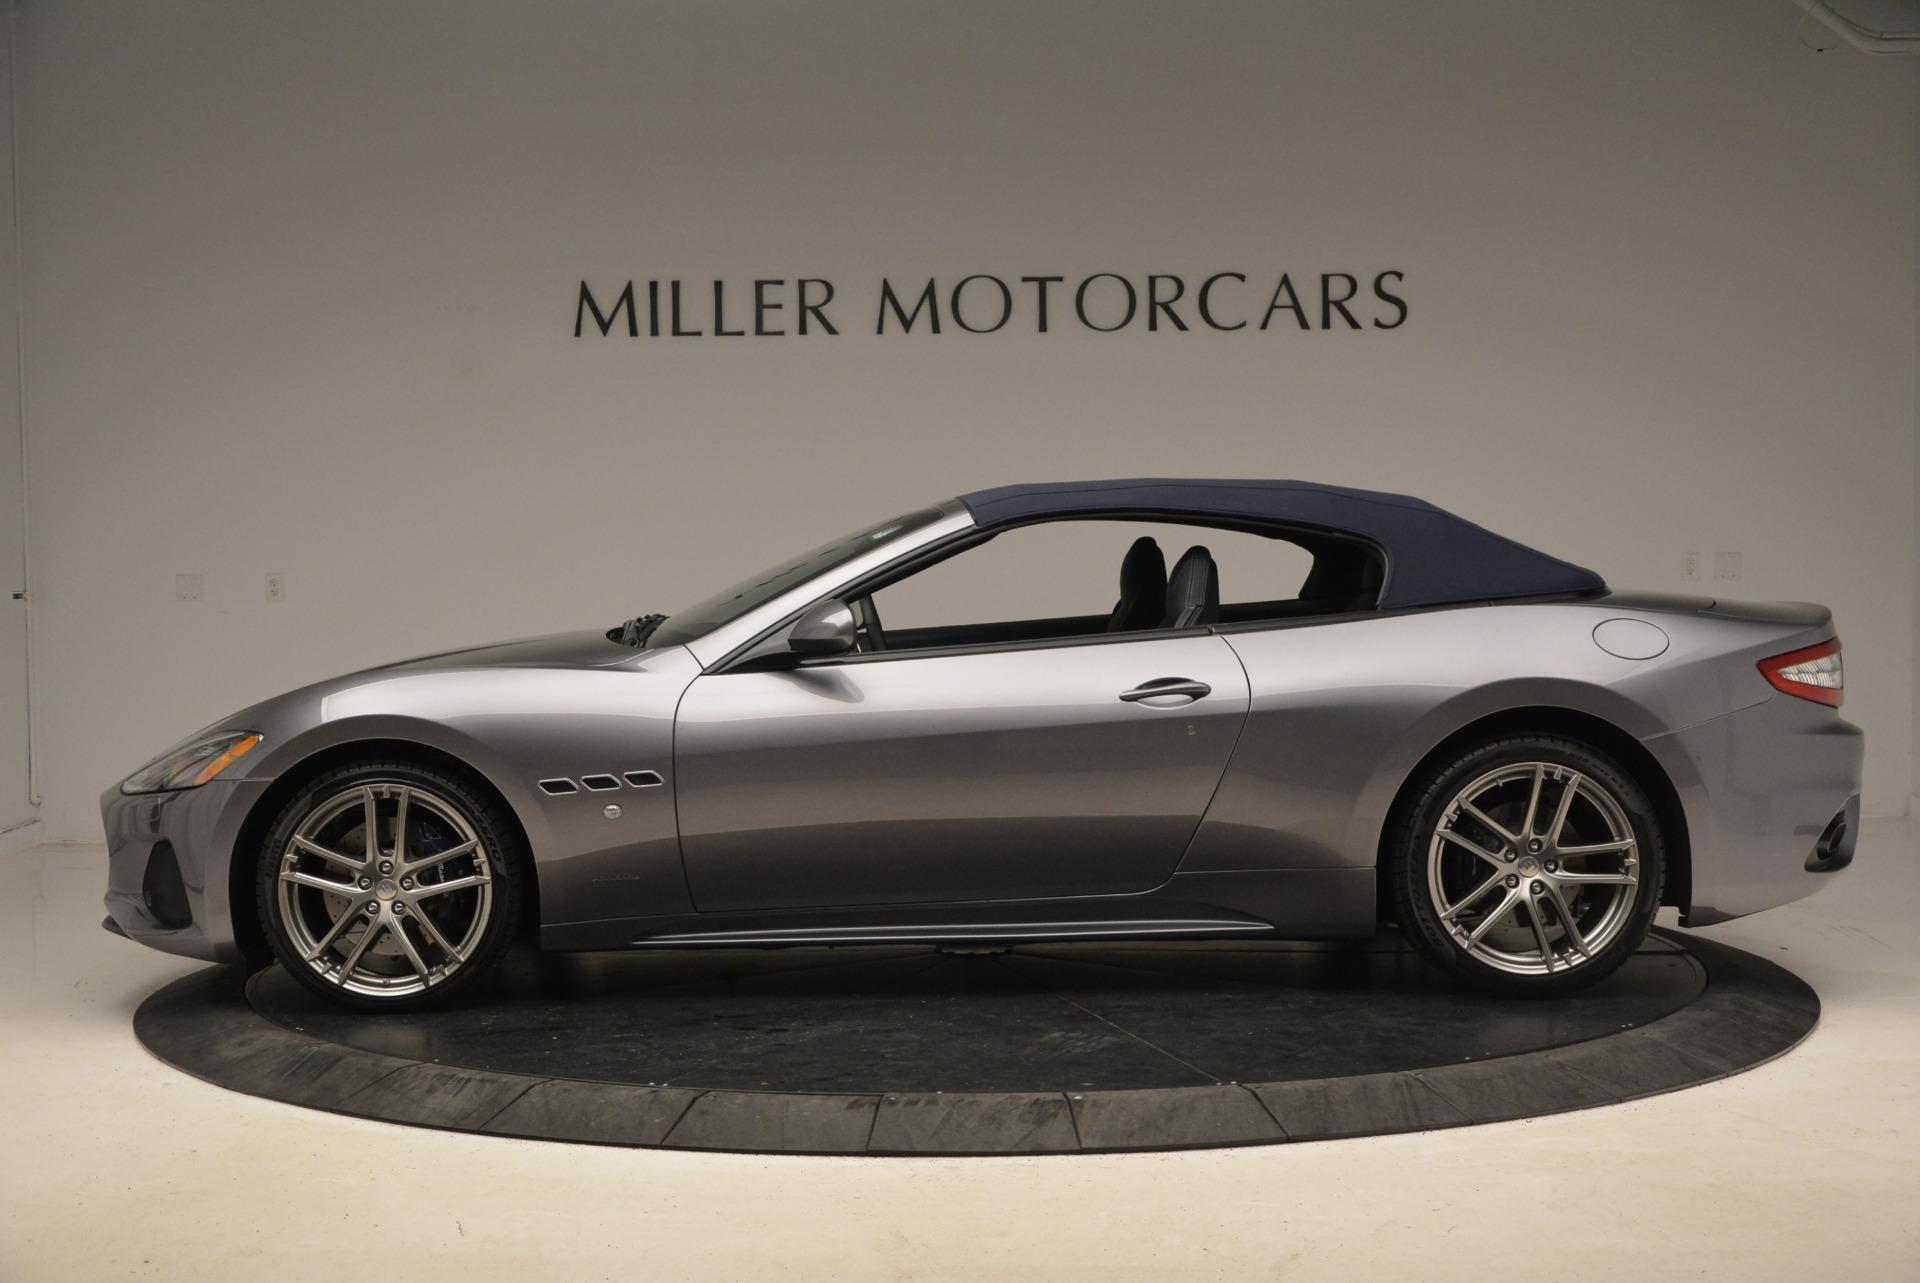 New 2018 Maserati GranTurismo Sport Convertible For Sale In Westport, CT 2272_p4